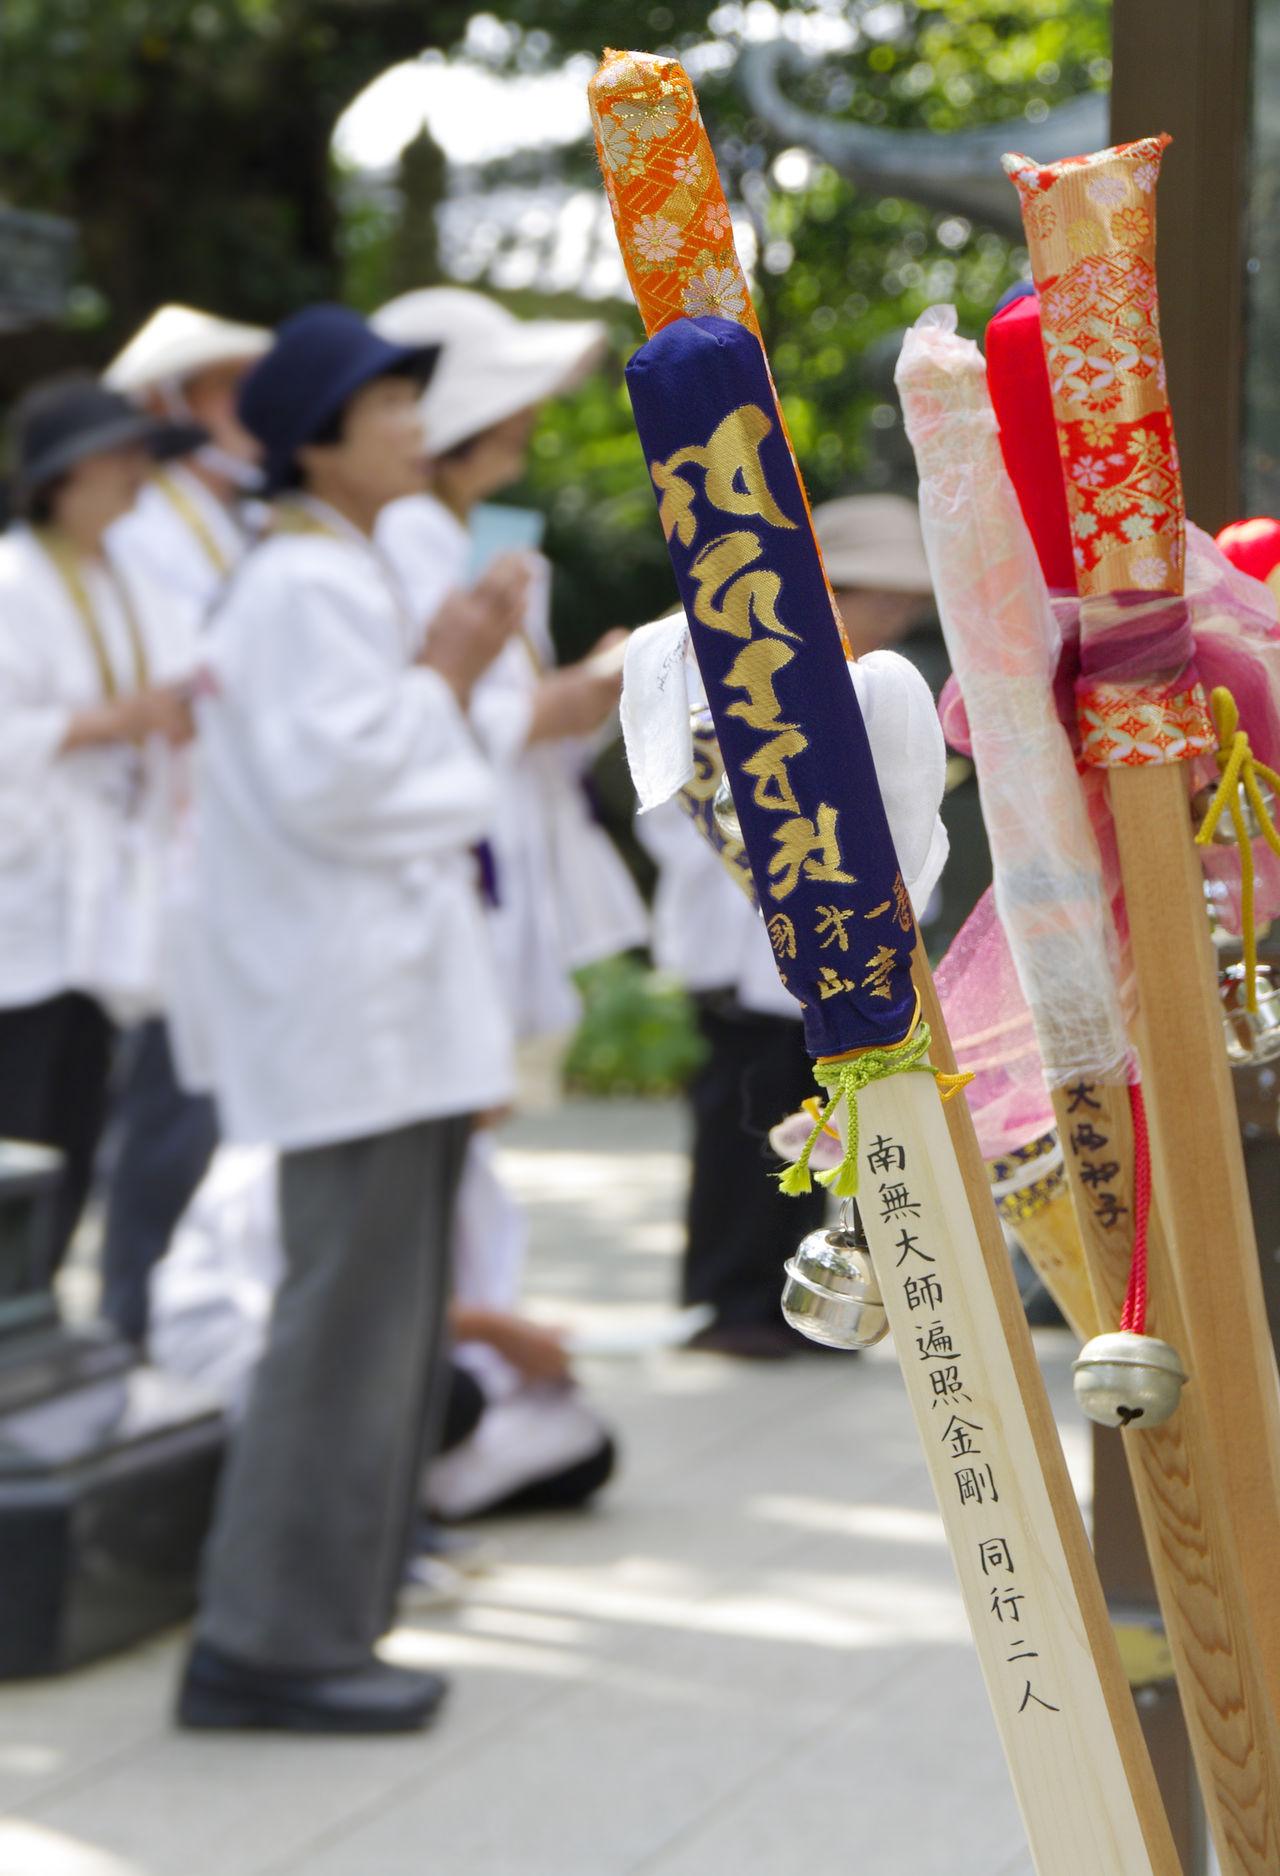 Day Japan Outdoors People Prayer Sticks Real People Shikoku Shinto Shrine Text Travel Worship